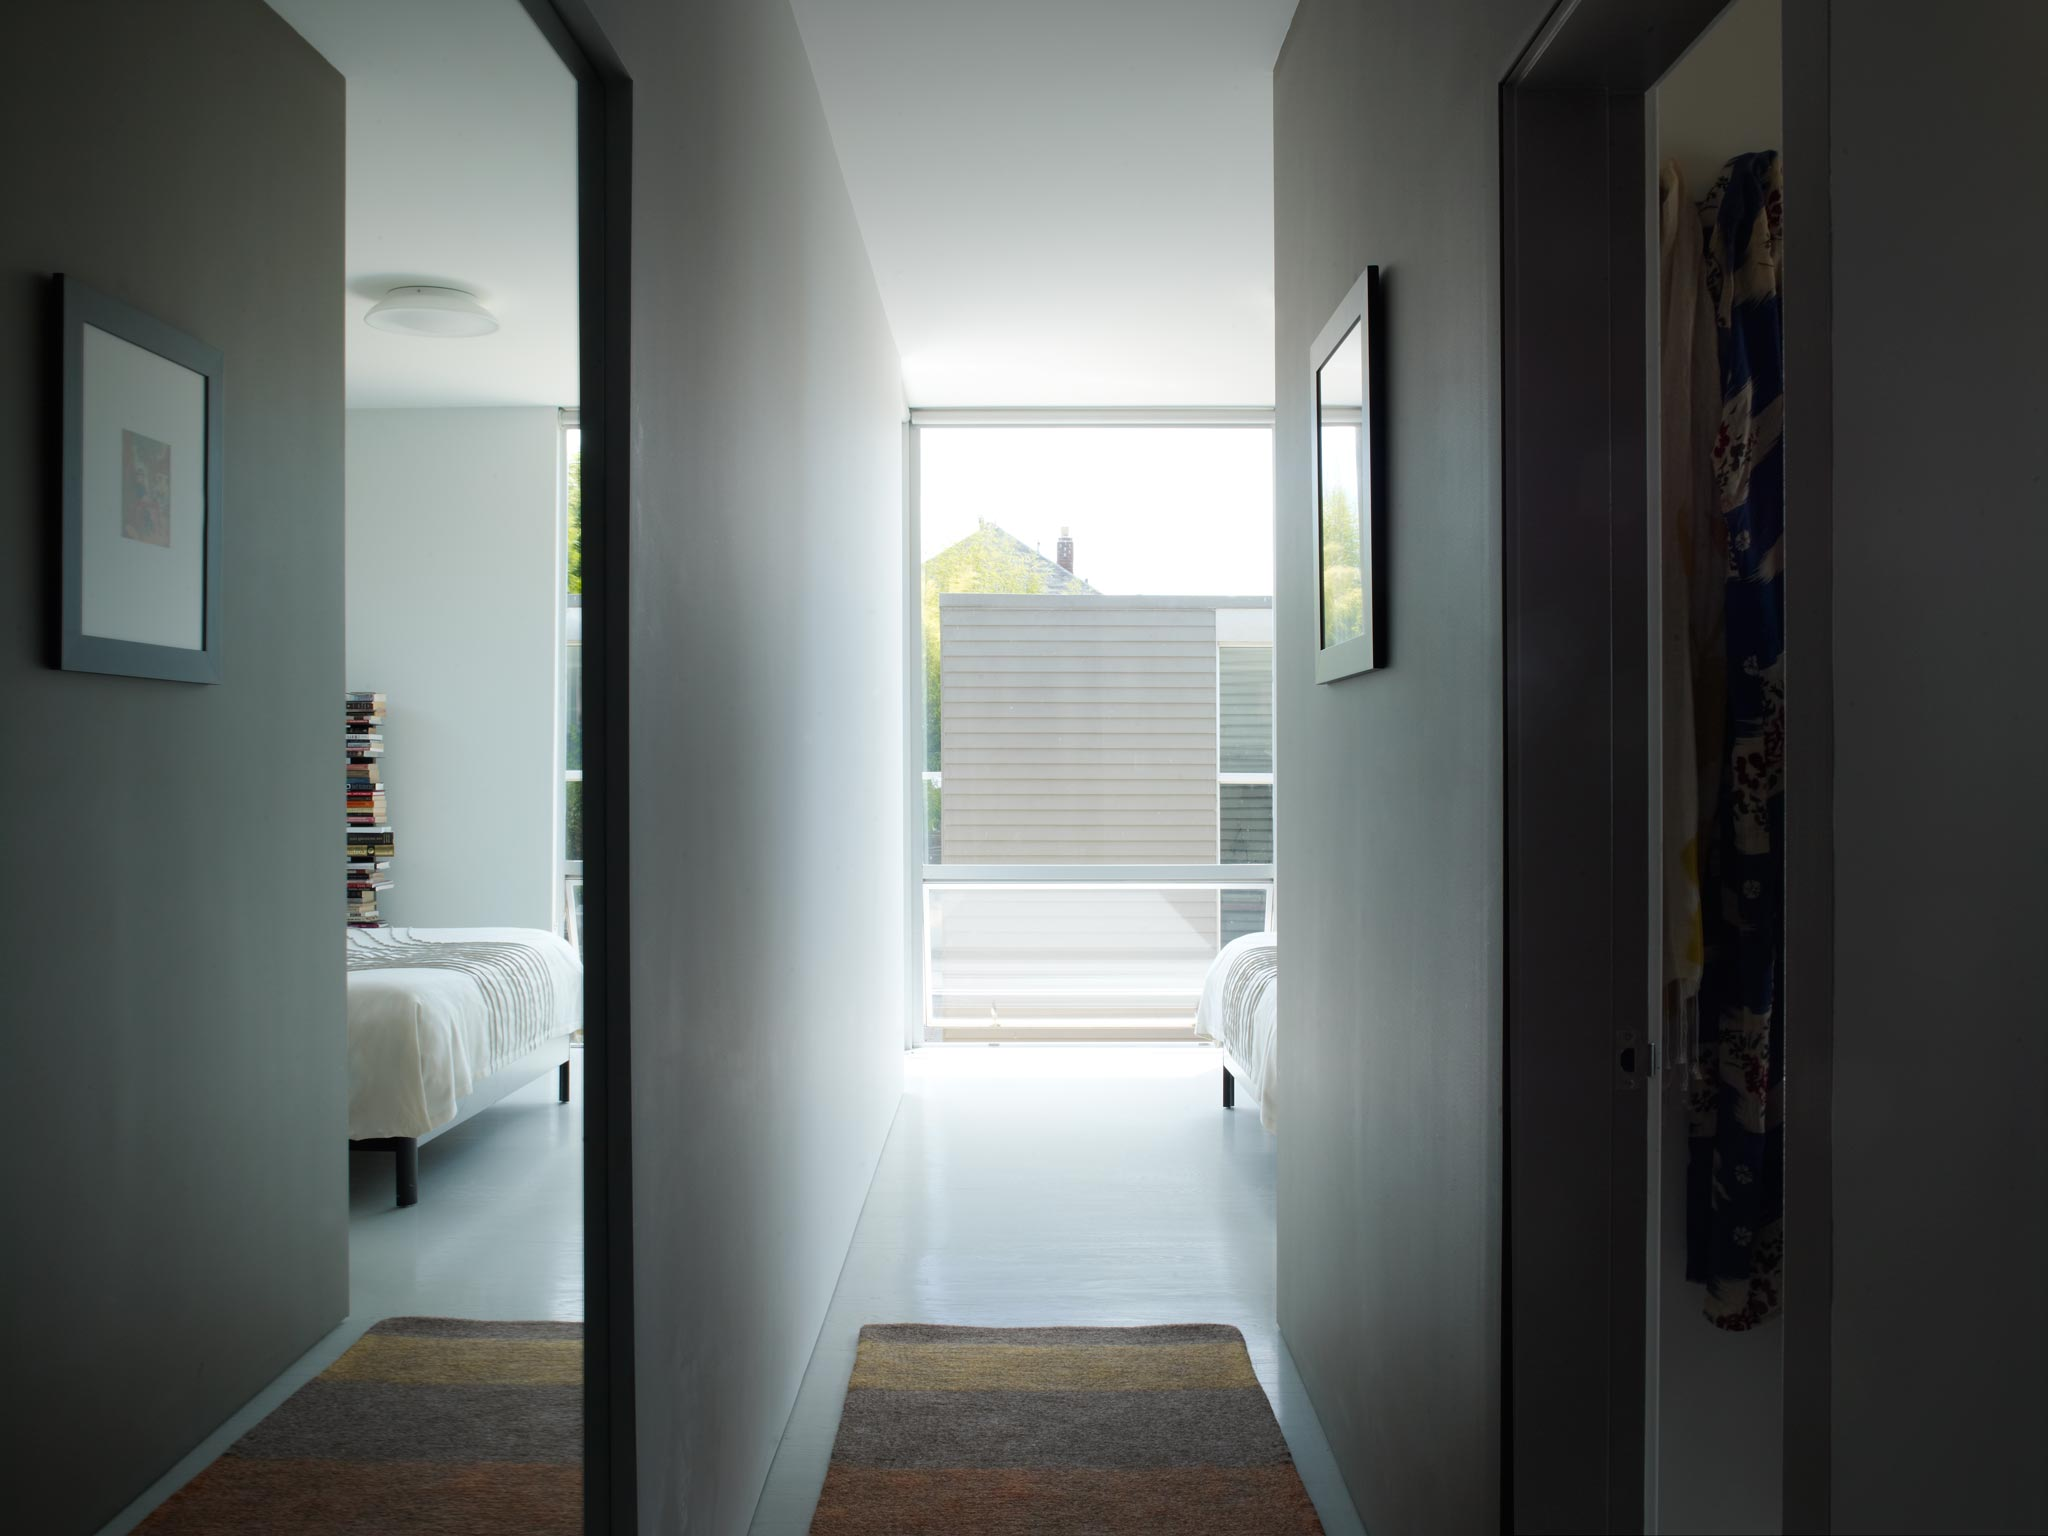 Oakland Urban modern master suite, roof deck and artist's studio interior view of halls